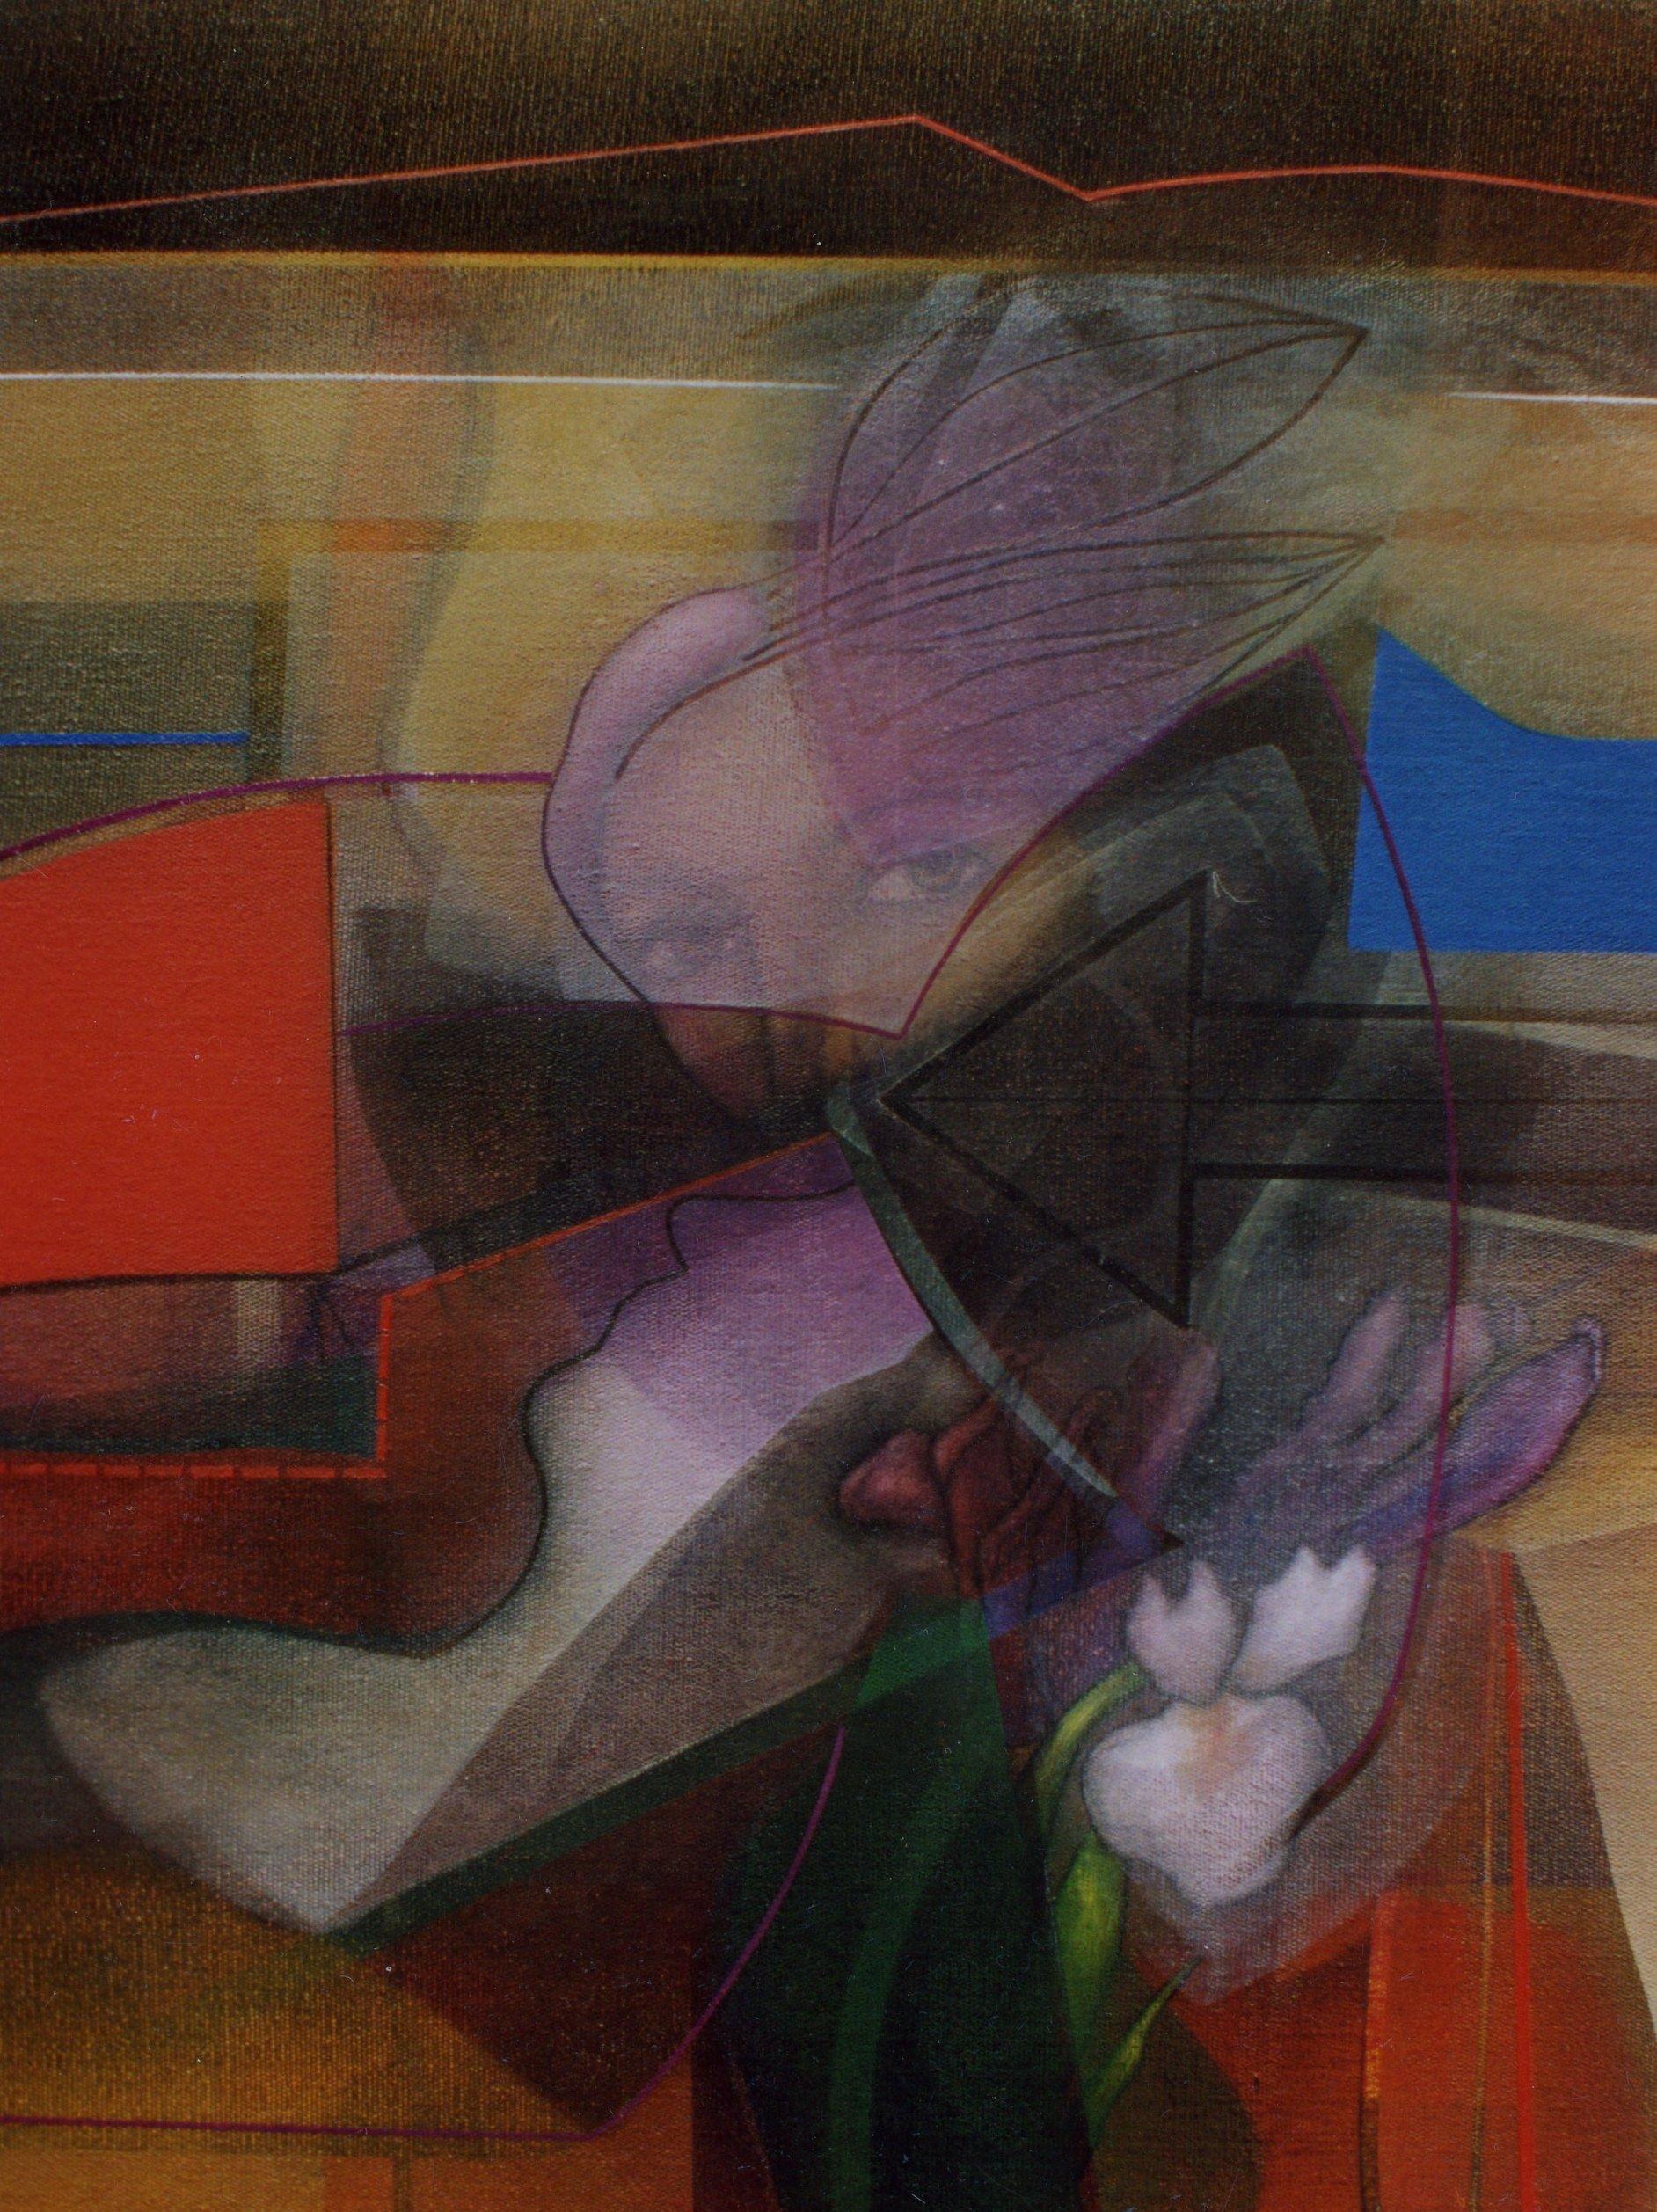 Ausencia en silencio. Óleo sobre lino. 81 X 65 cm (2003) - Asmat Chirinos-Zavala